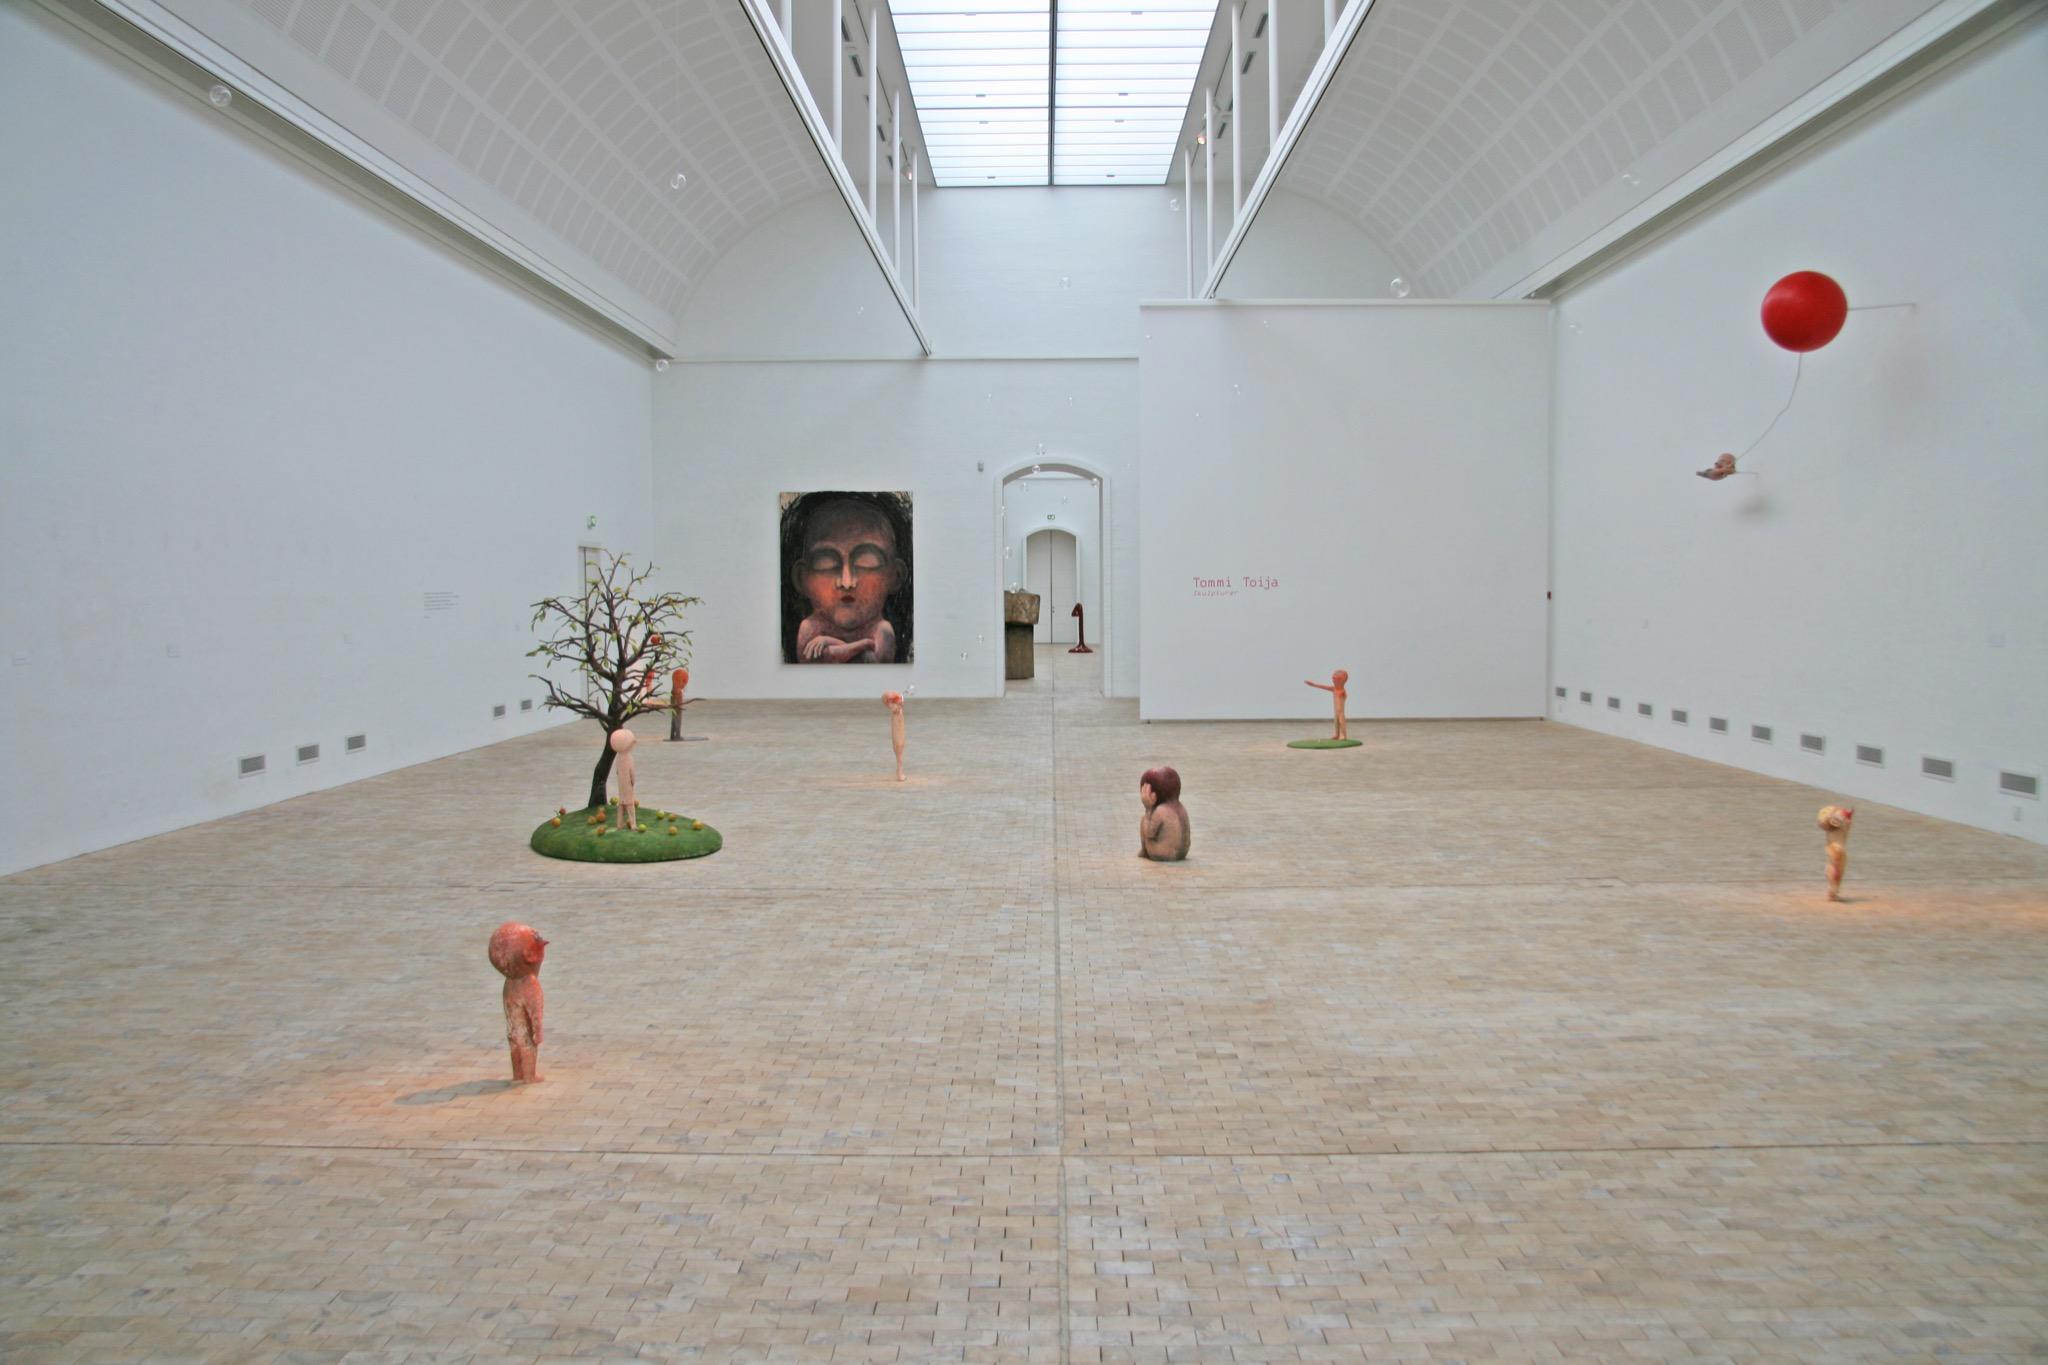 Sønderjyllands kunstmuseum, Tønder,Denmark 2011 -